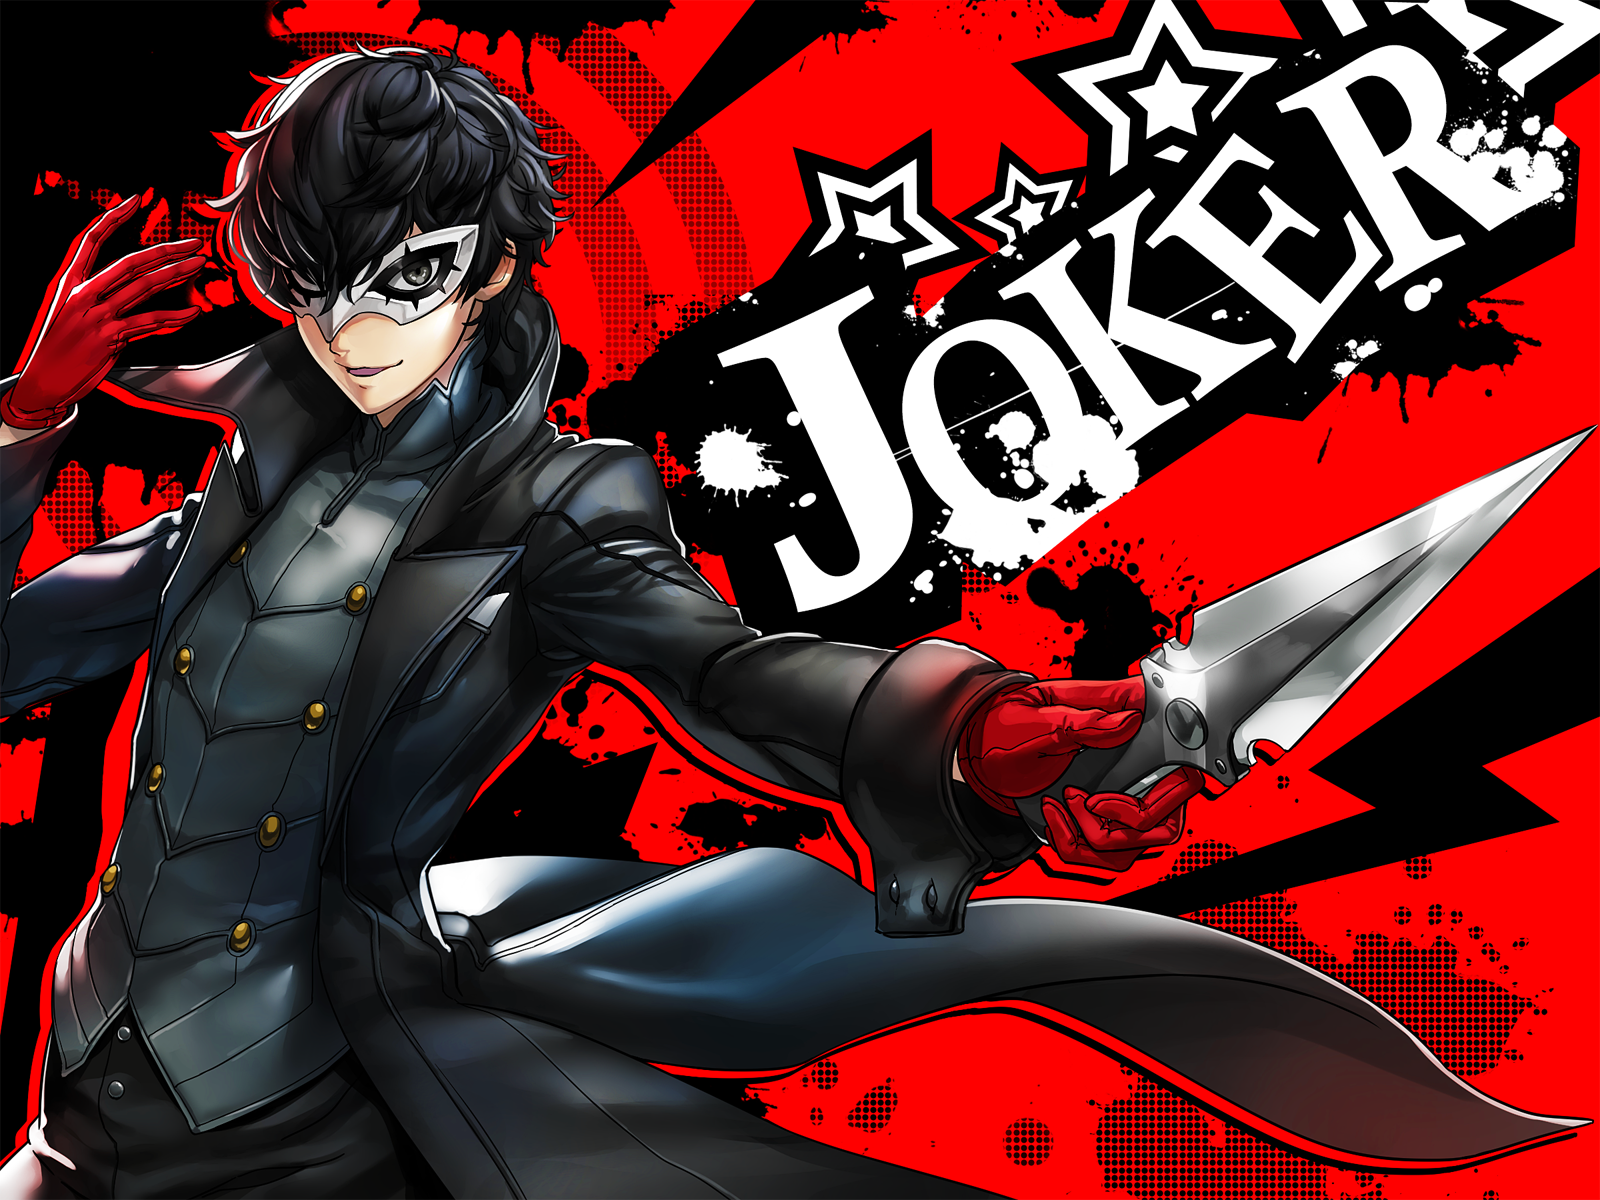 Persona 5 Joker Persona 5 Persona 5 Joker Persona